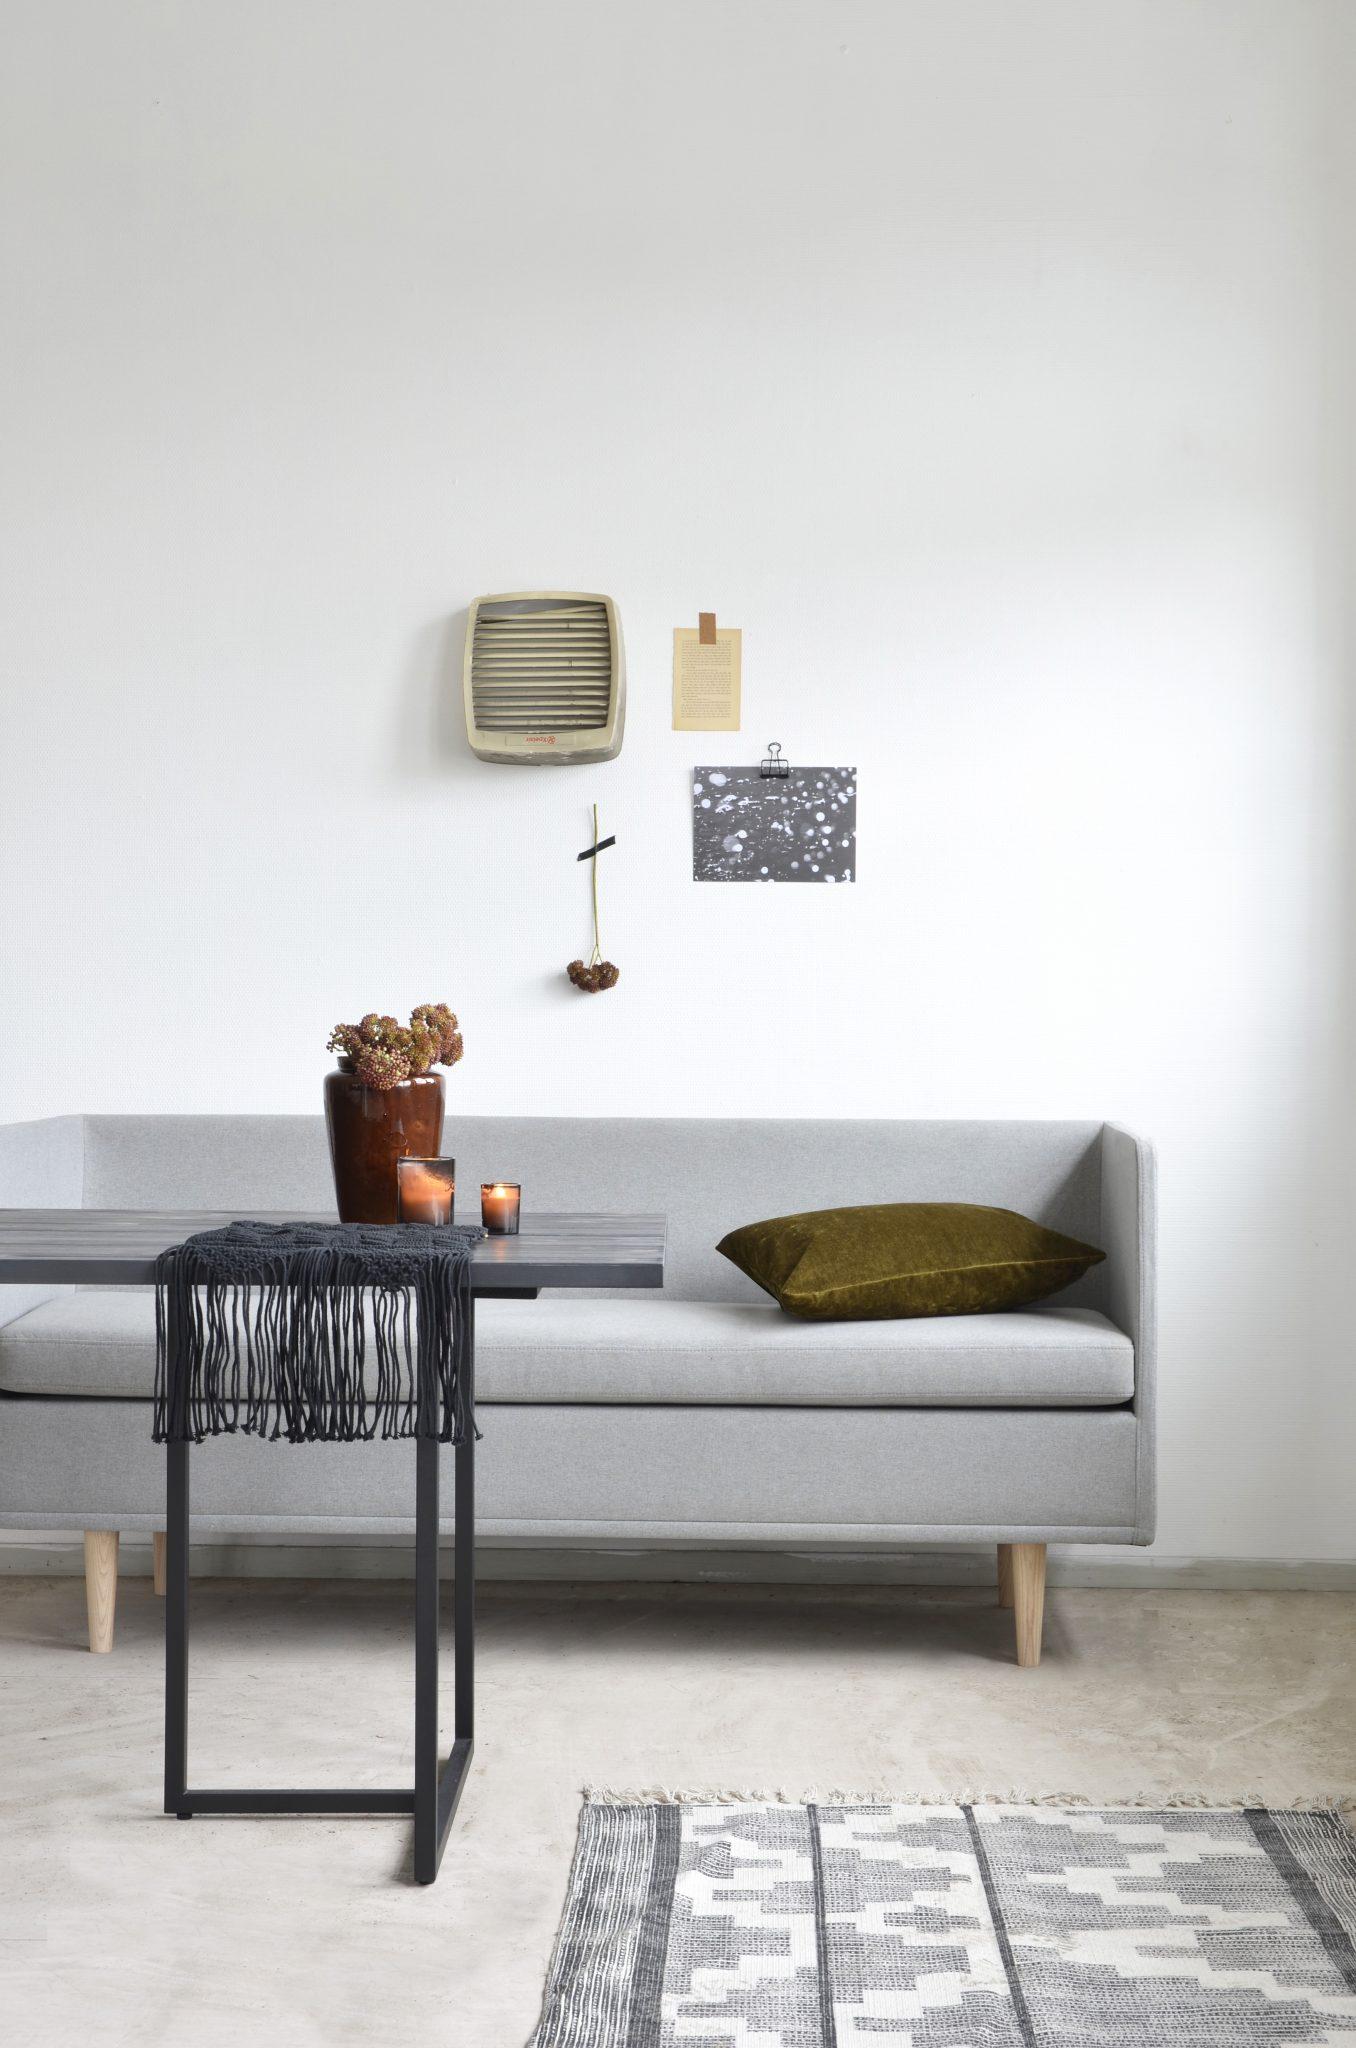 S Sofa Mingle 190 StellaConcrete 01 - Mingle spisesofa